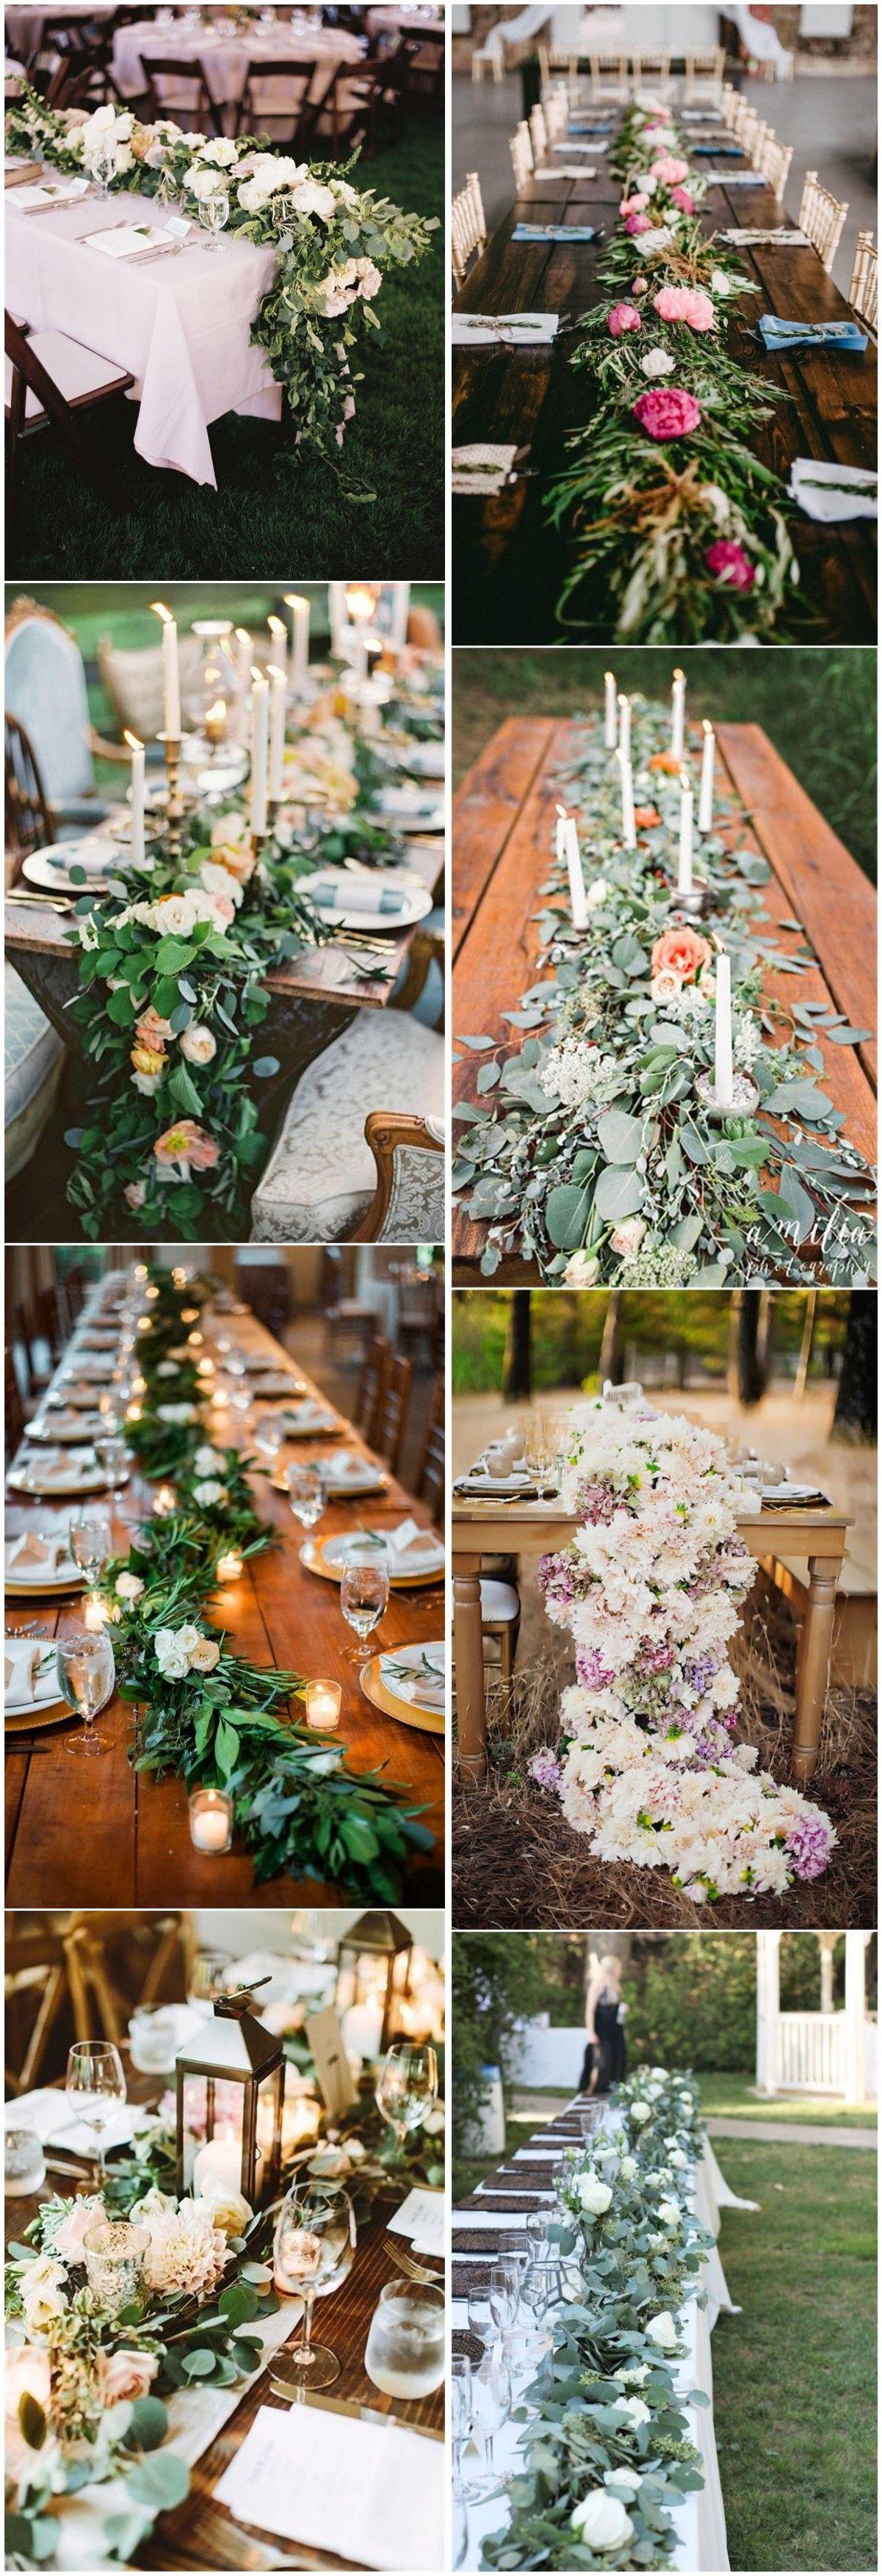 Wedding Decorations » Wedding Trend—23 Unique Floral Wedding Garland Table Runner Ideas